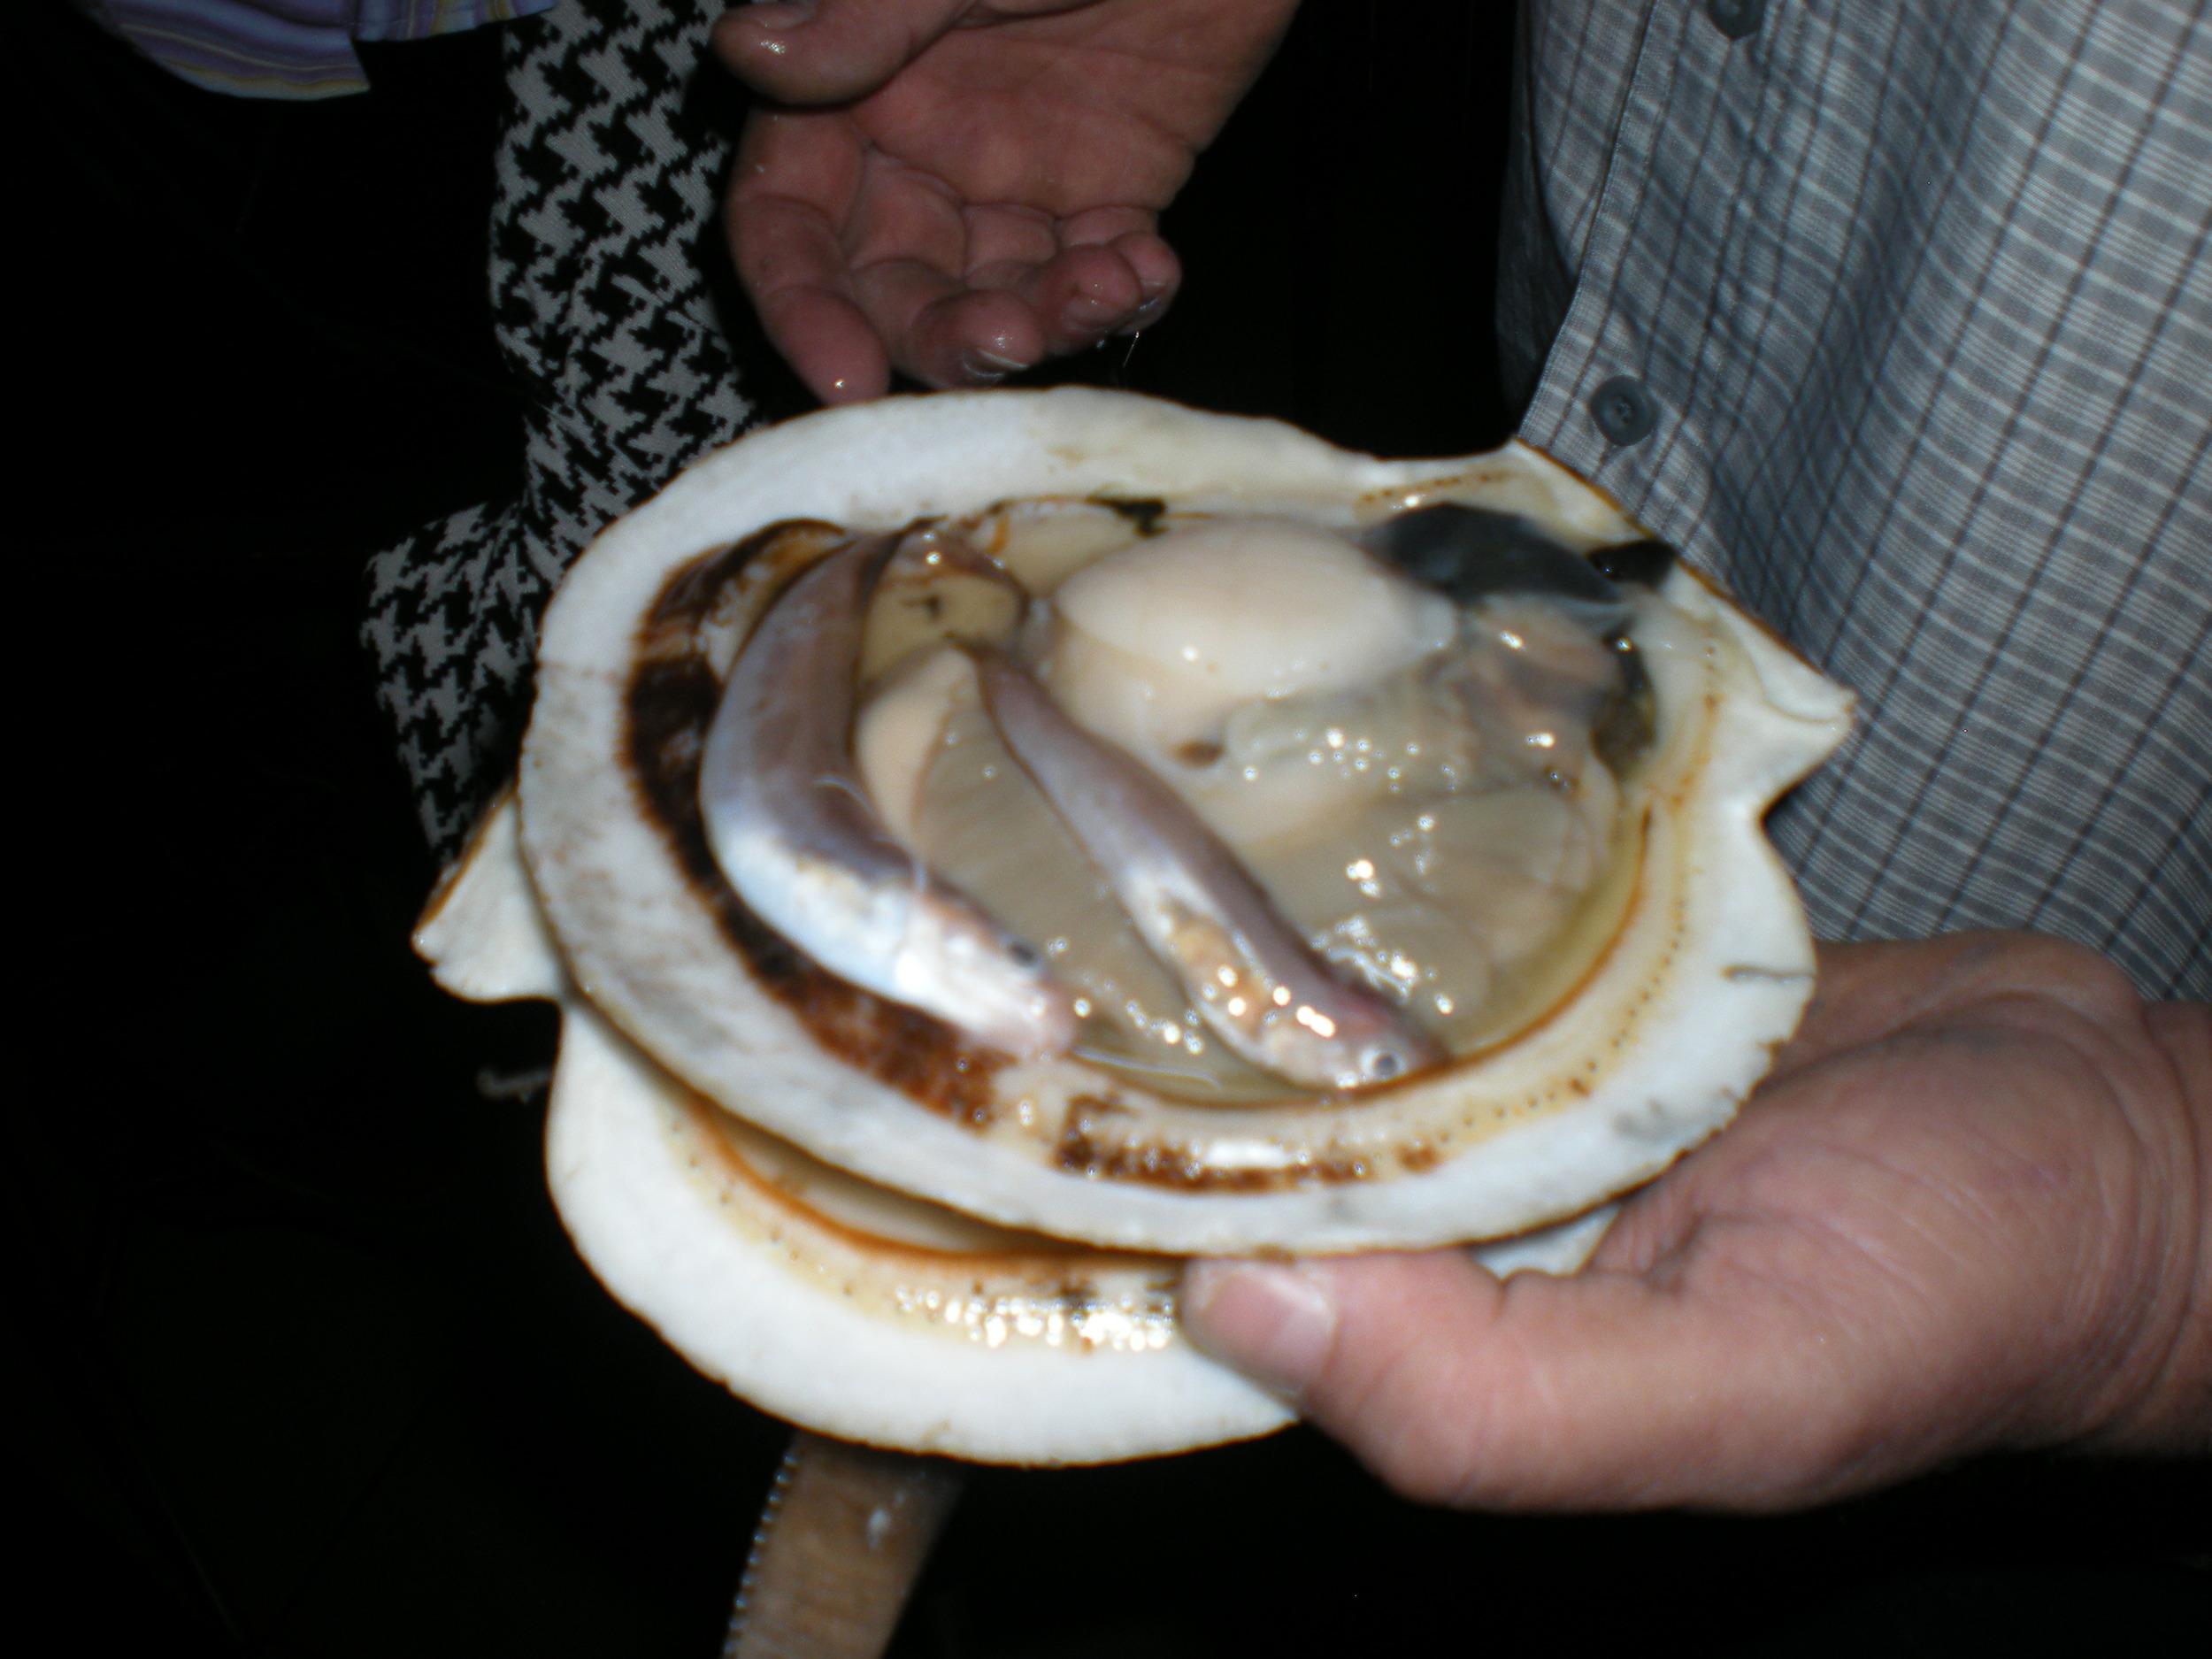 Juvenile red hake inside live sea scallops